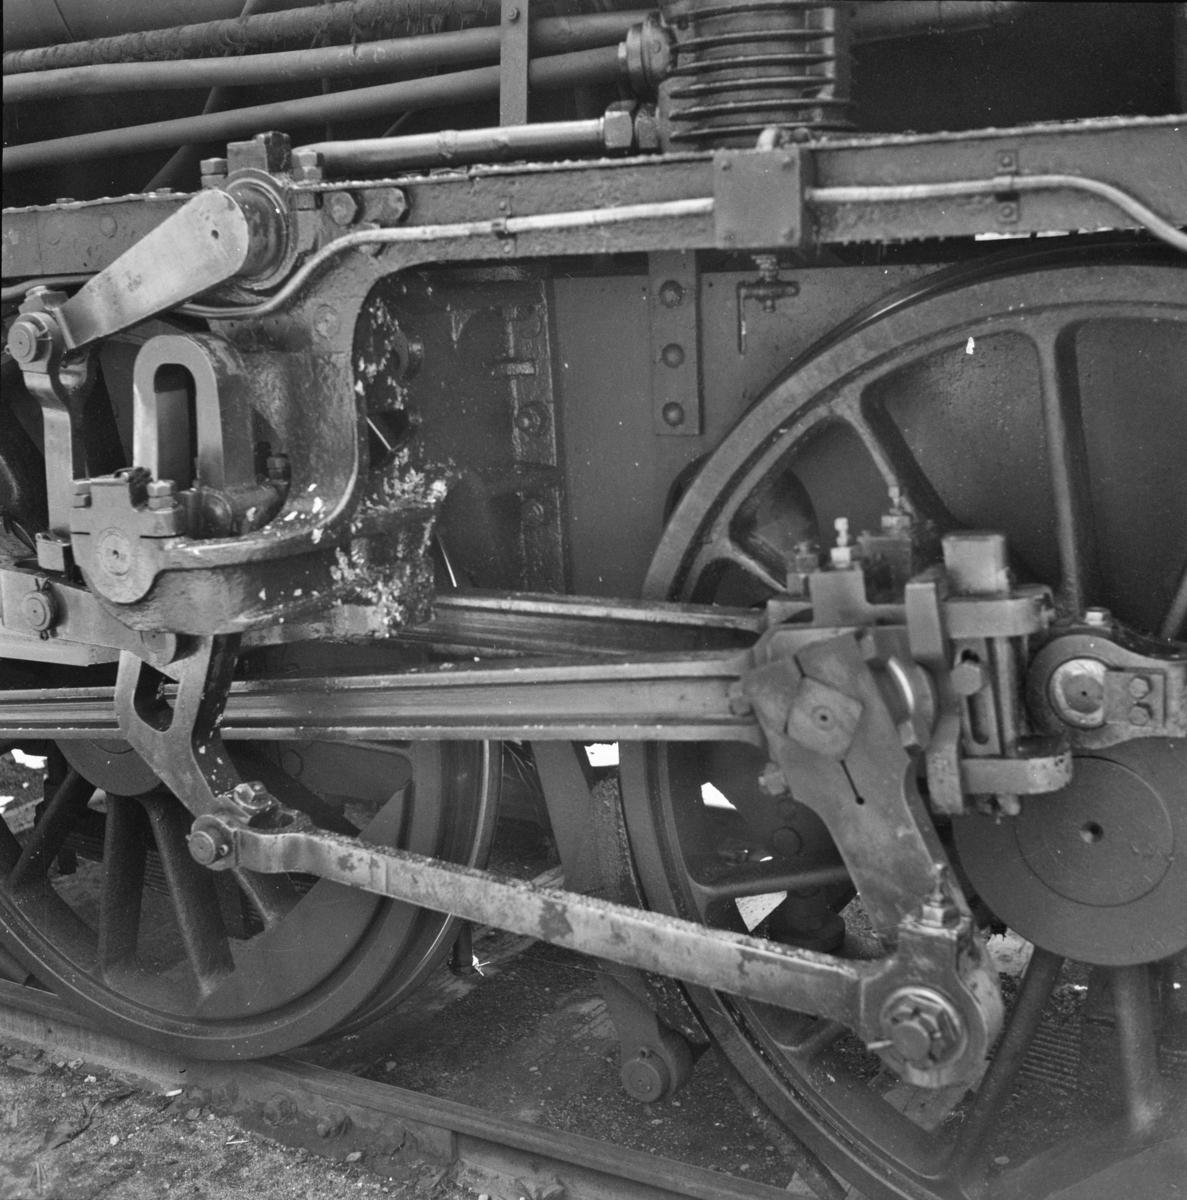 Detalj på damplokomotiv 21e nr. 207.